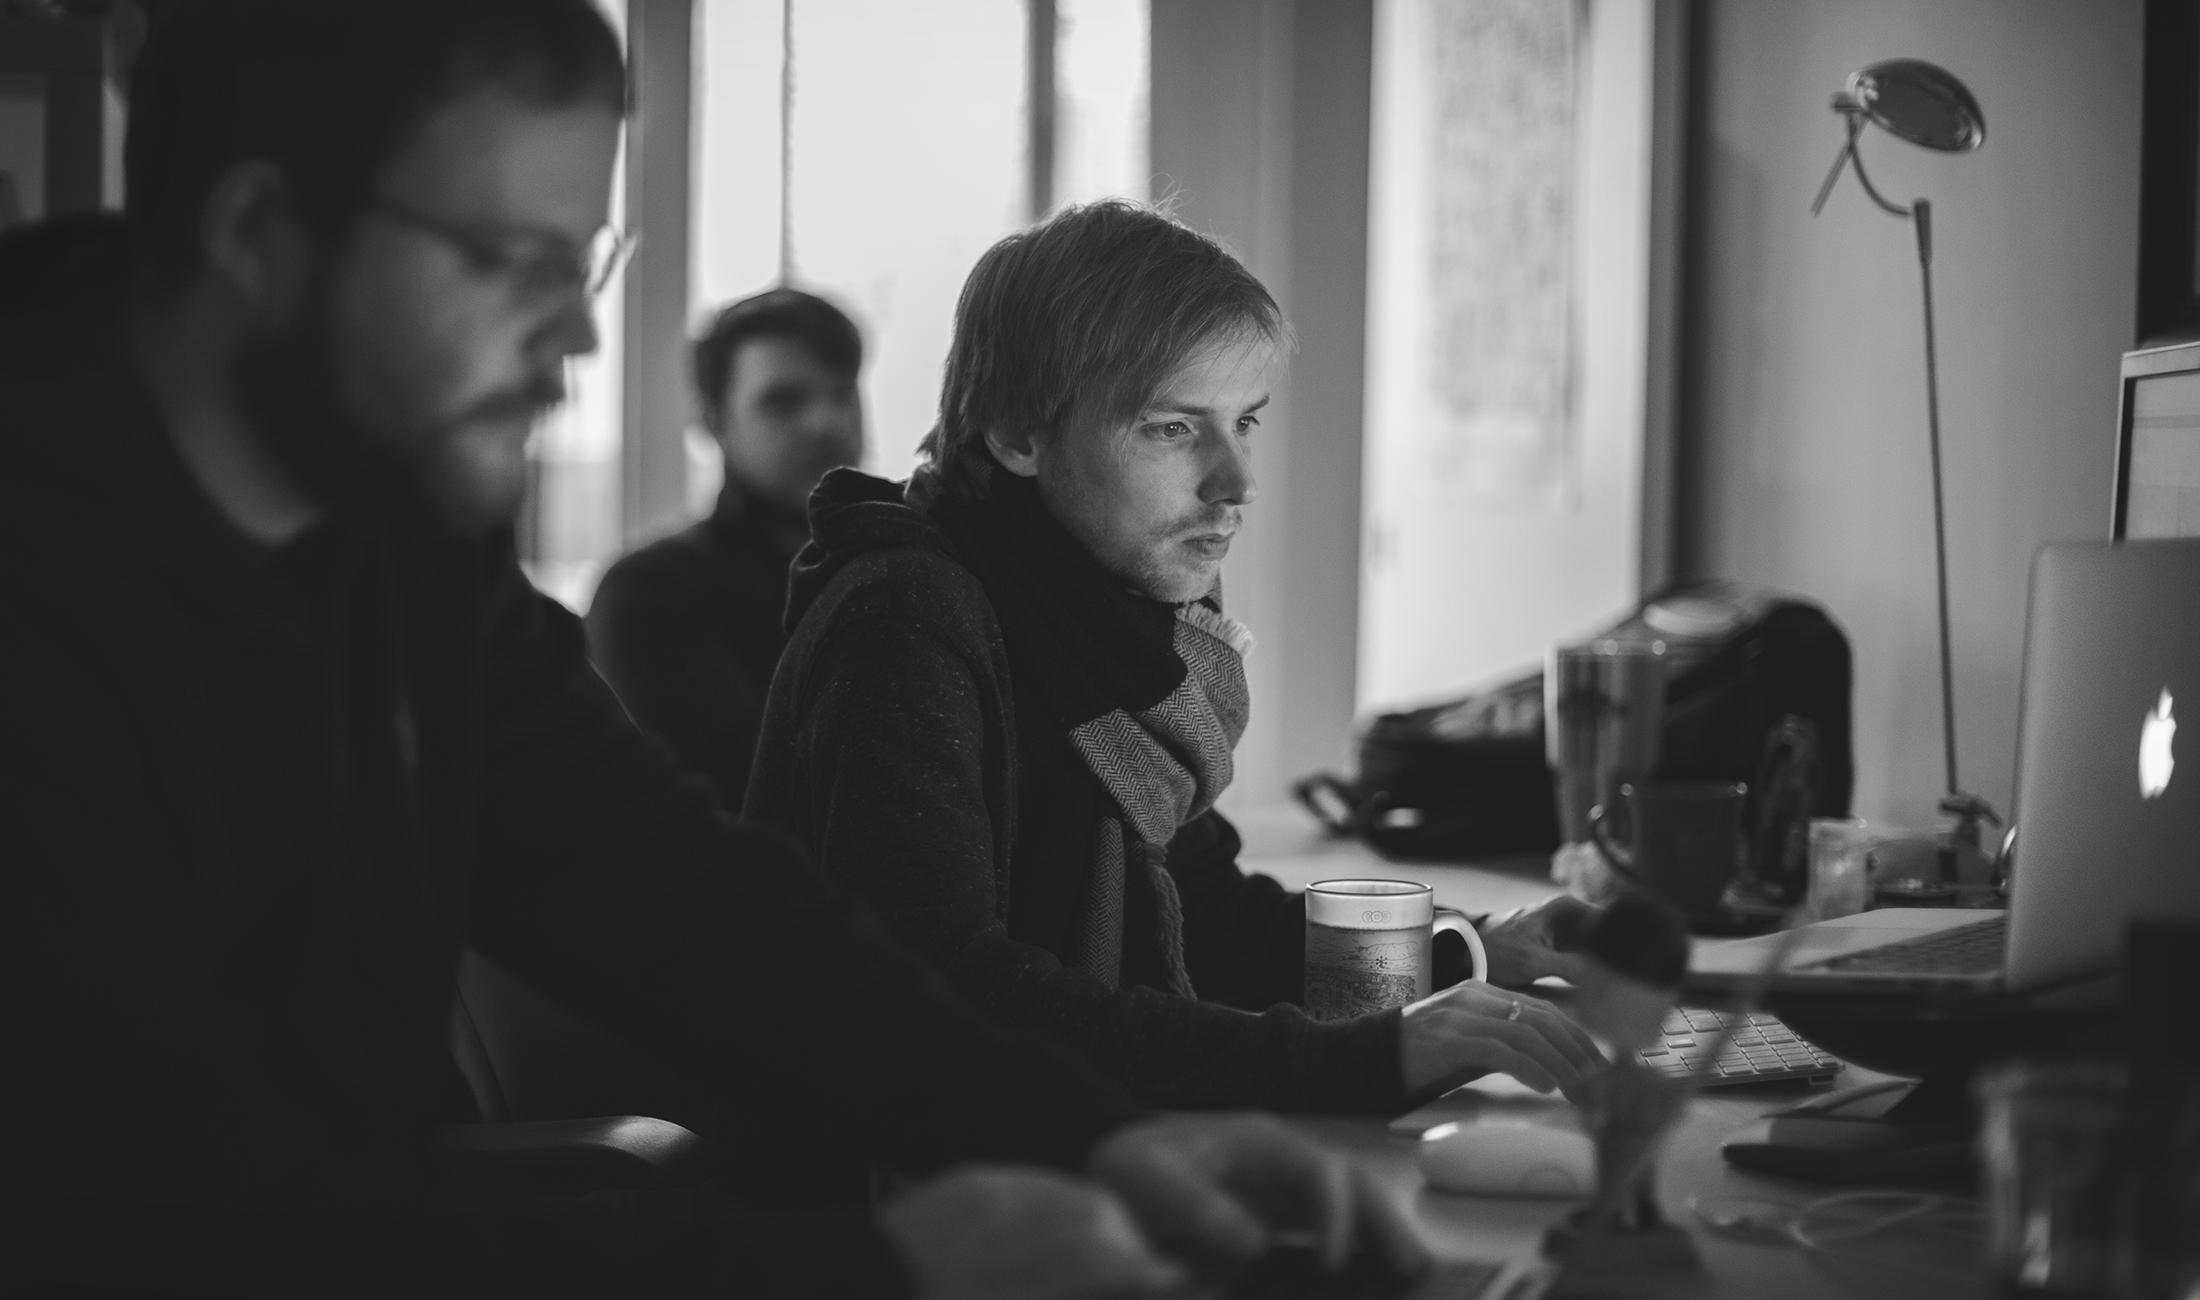 The Development team at Imagebox